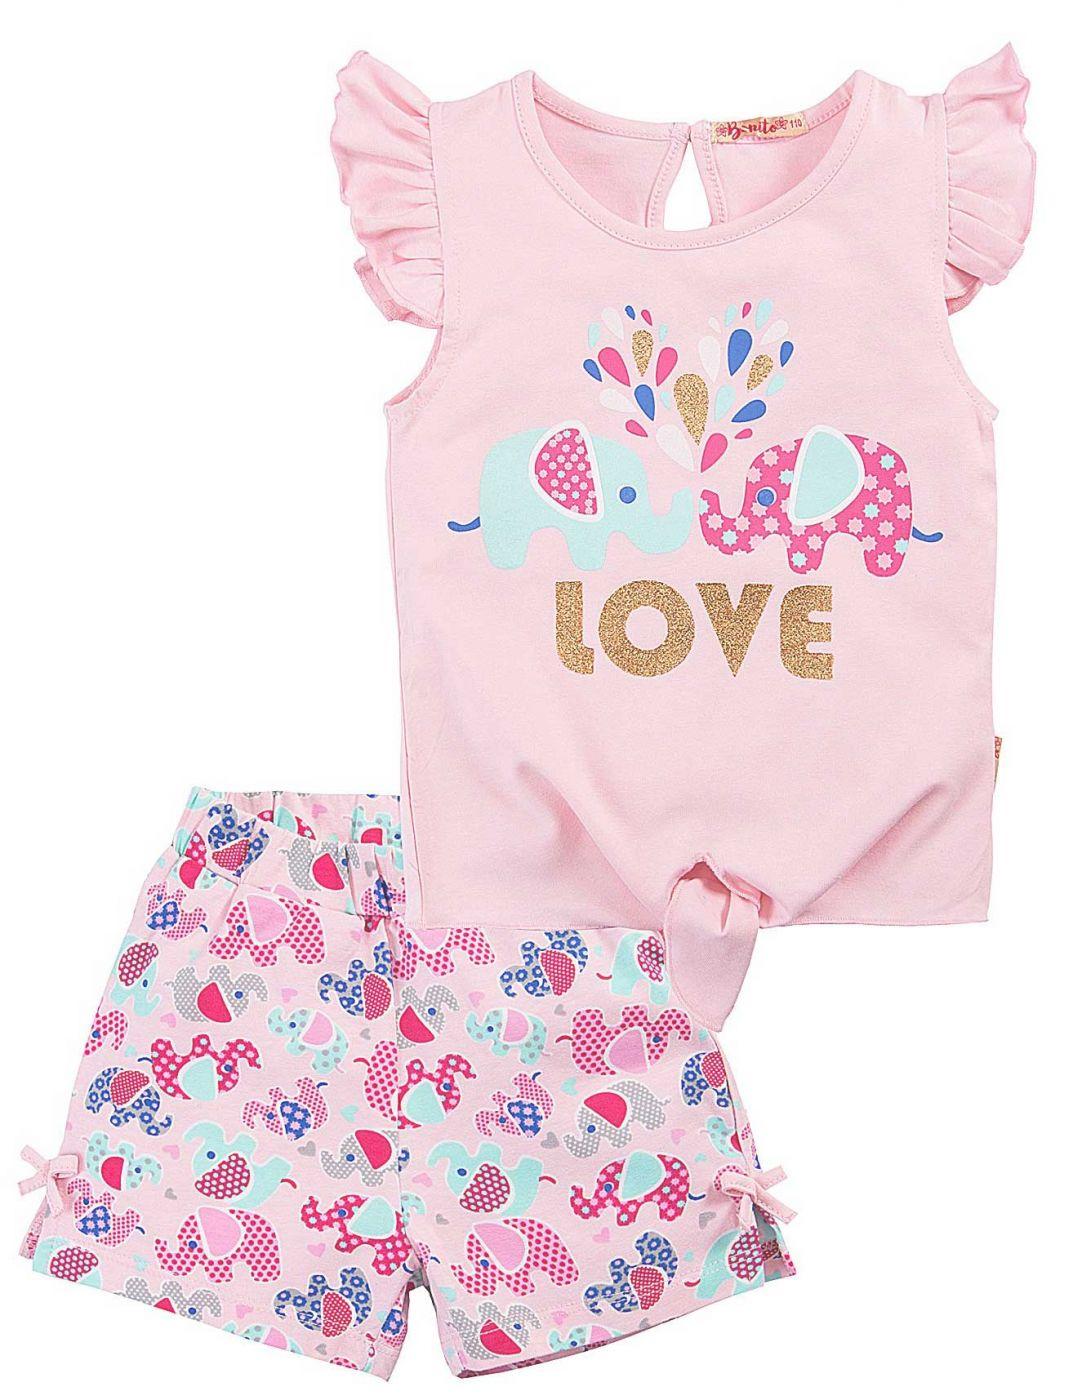 Летний костюм для девочек Bonito розовый слонята